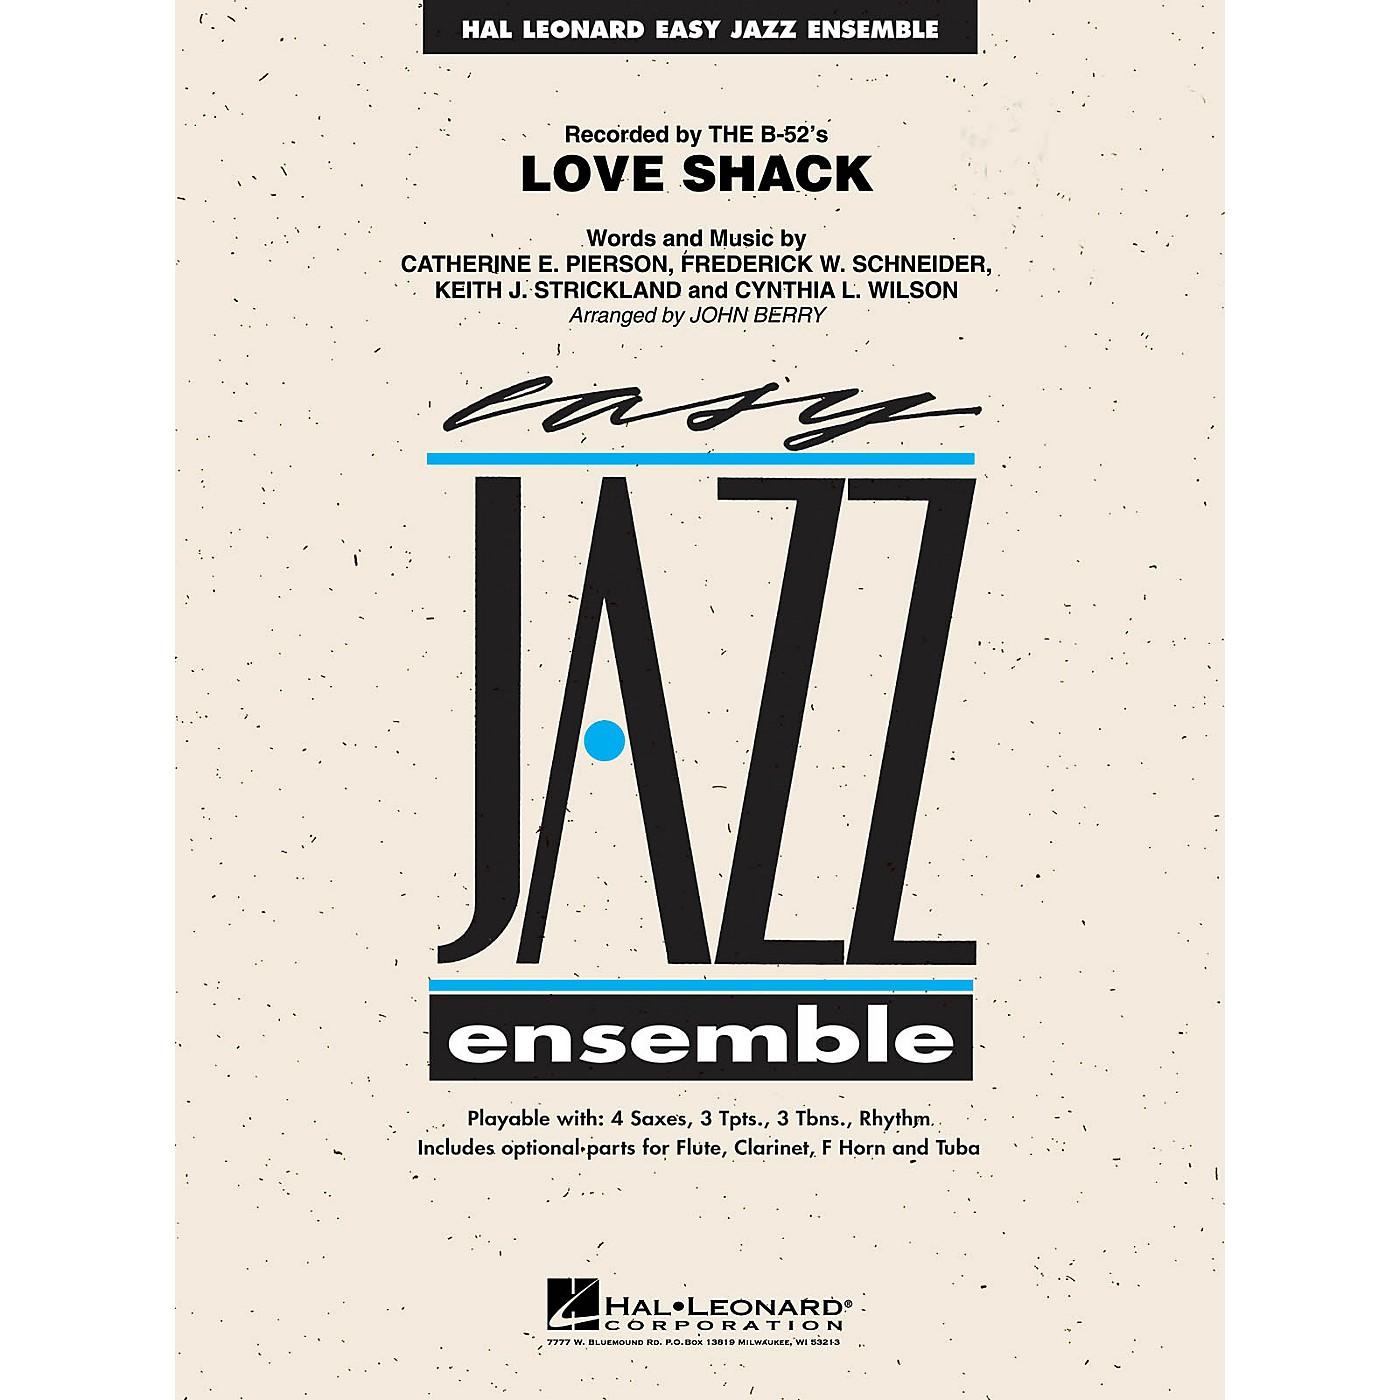 Hal Leonard Love Shack Jazz Band Level 2 by The B-52's Arranged by John Berry thumbnail